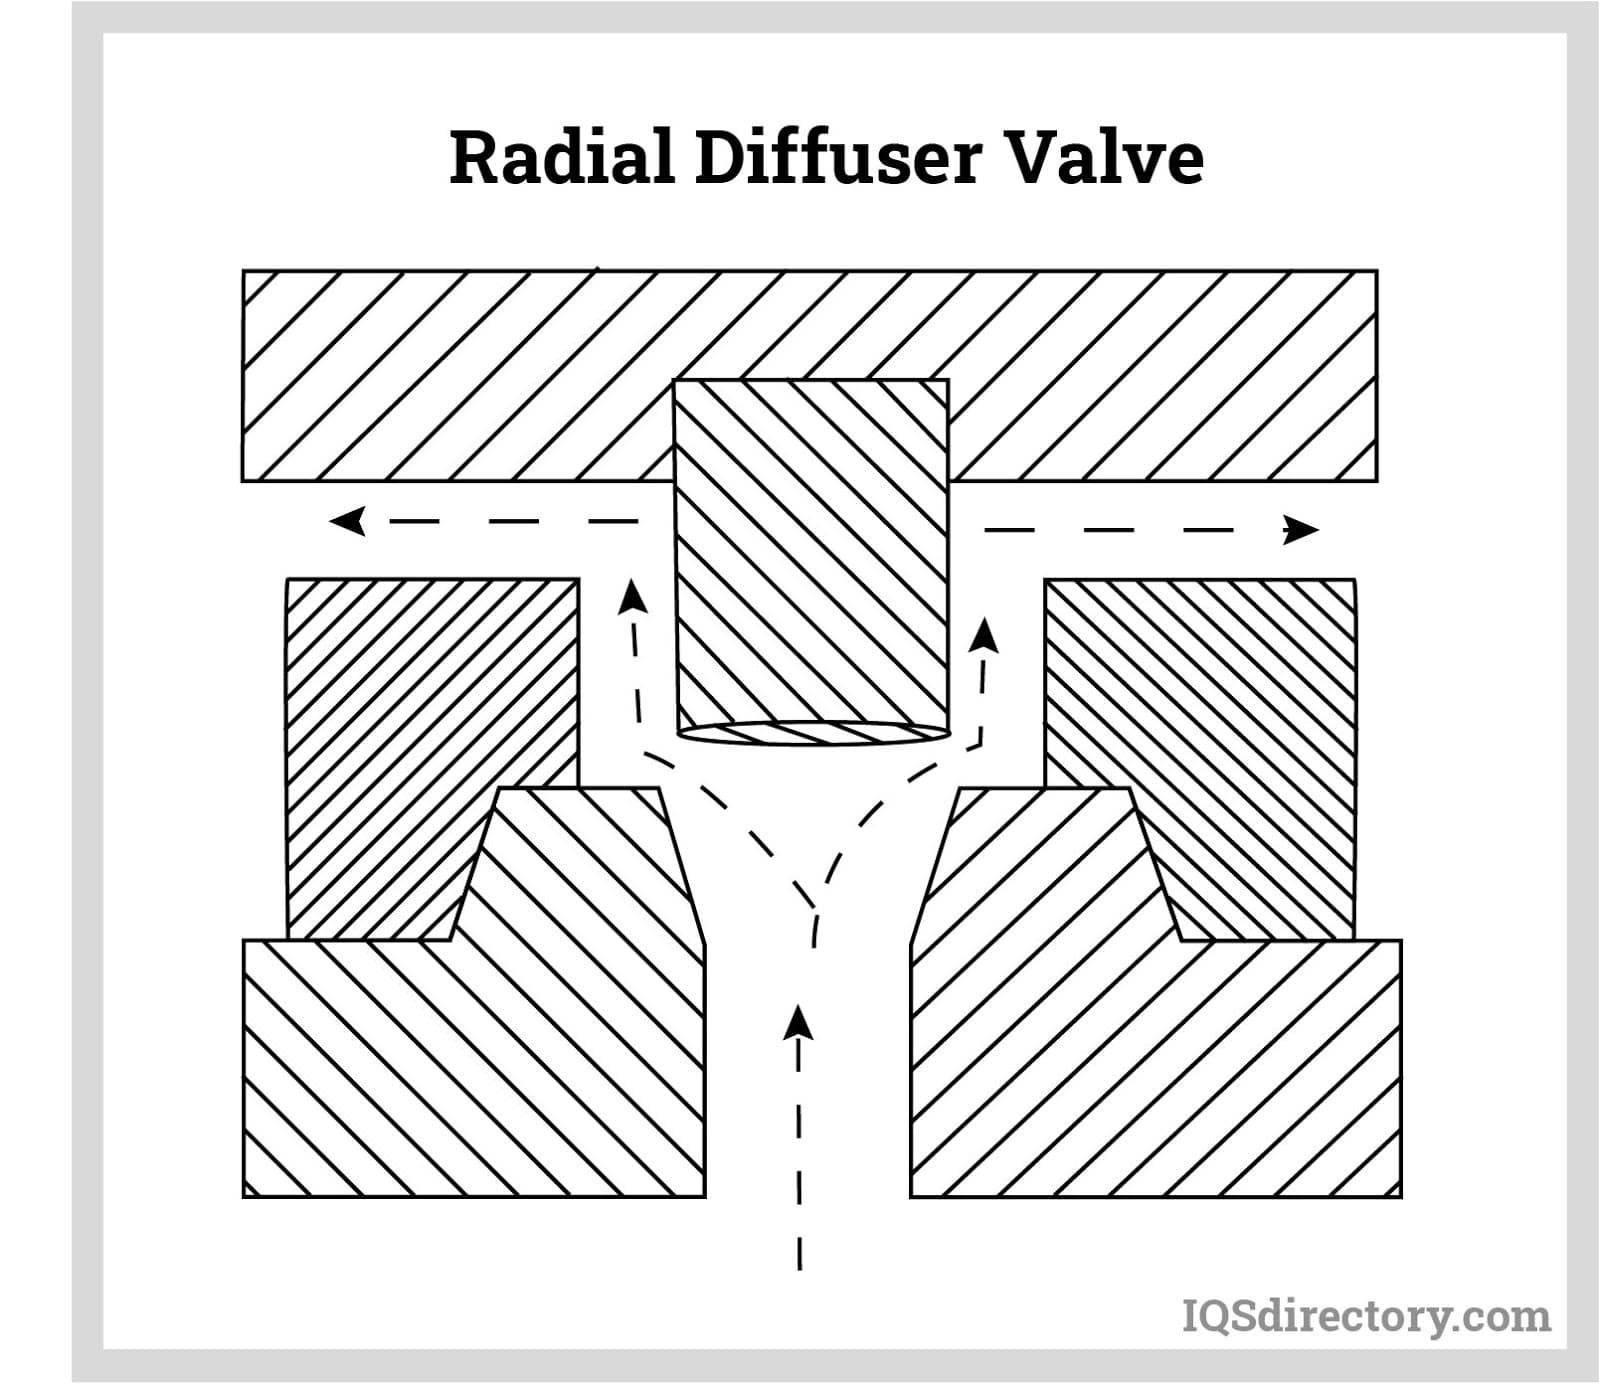 Radial Diffuser Valve